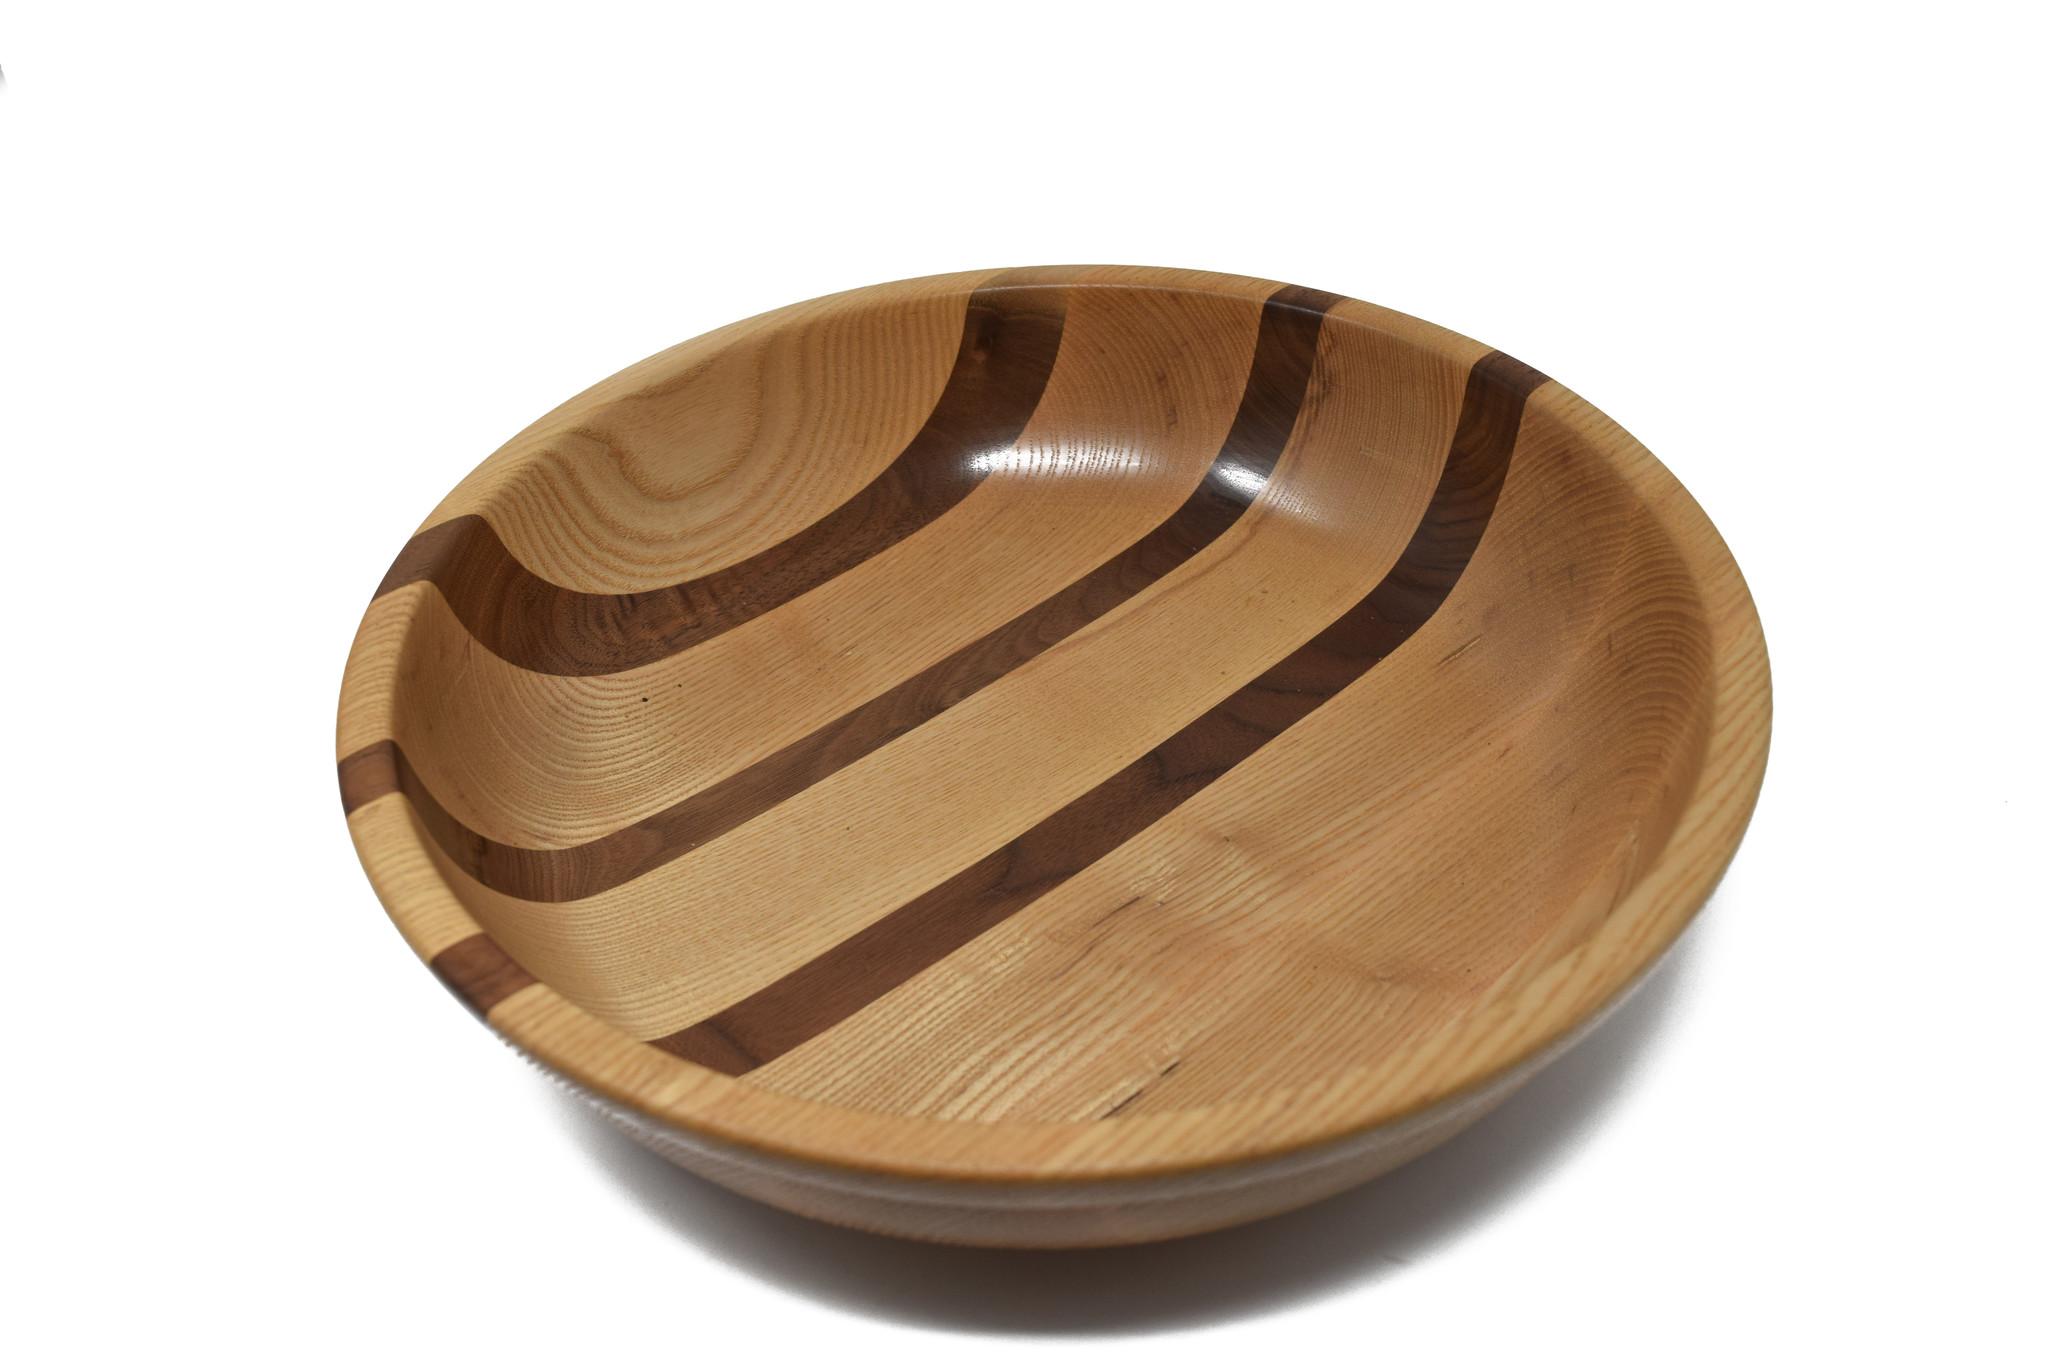 Wood Serving Bowl-1